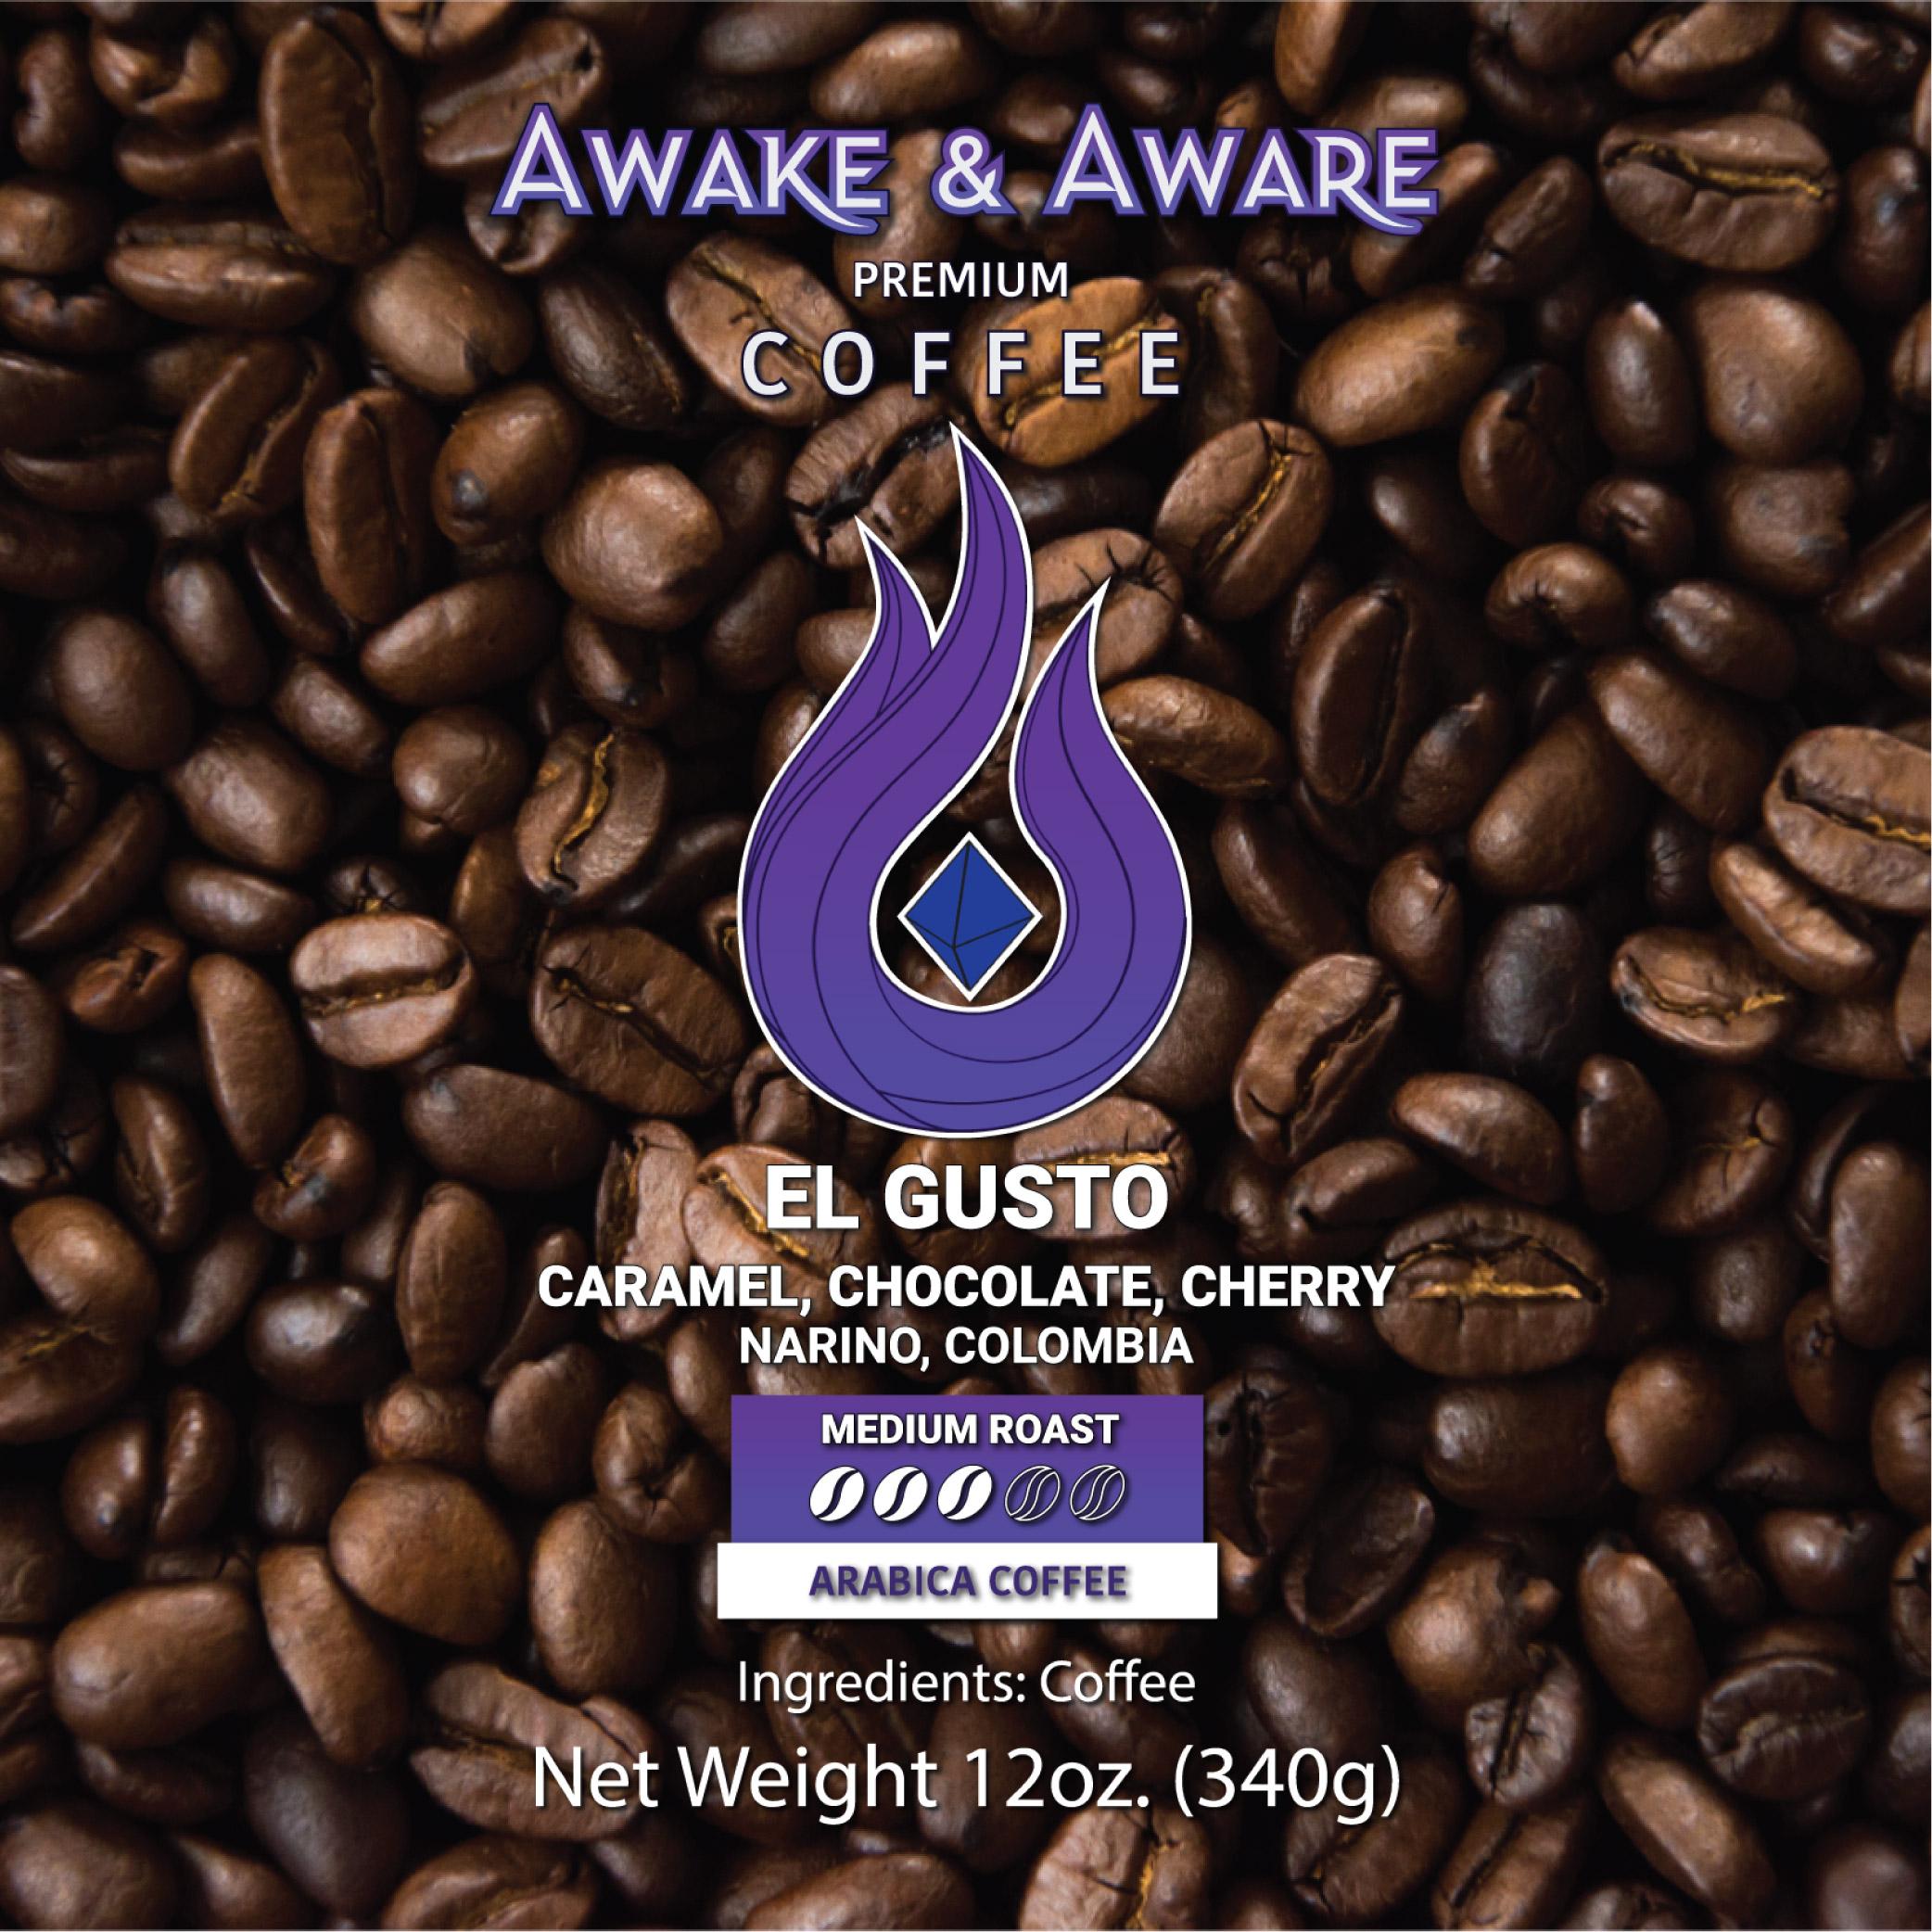 Awake-&-Aware-El-Gusto-(Narino, Columbia)-12oz-Single-Origin-Coffee-Beans-With-Clear-Label